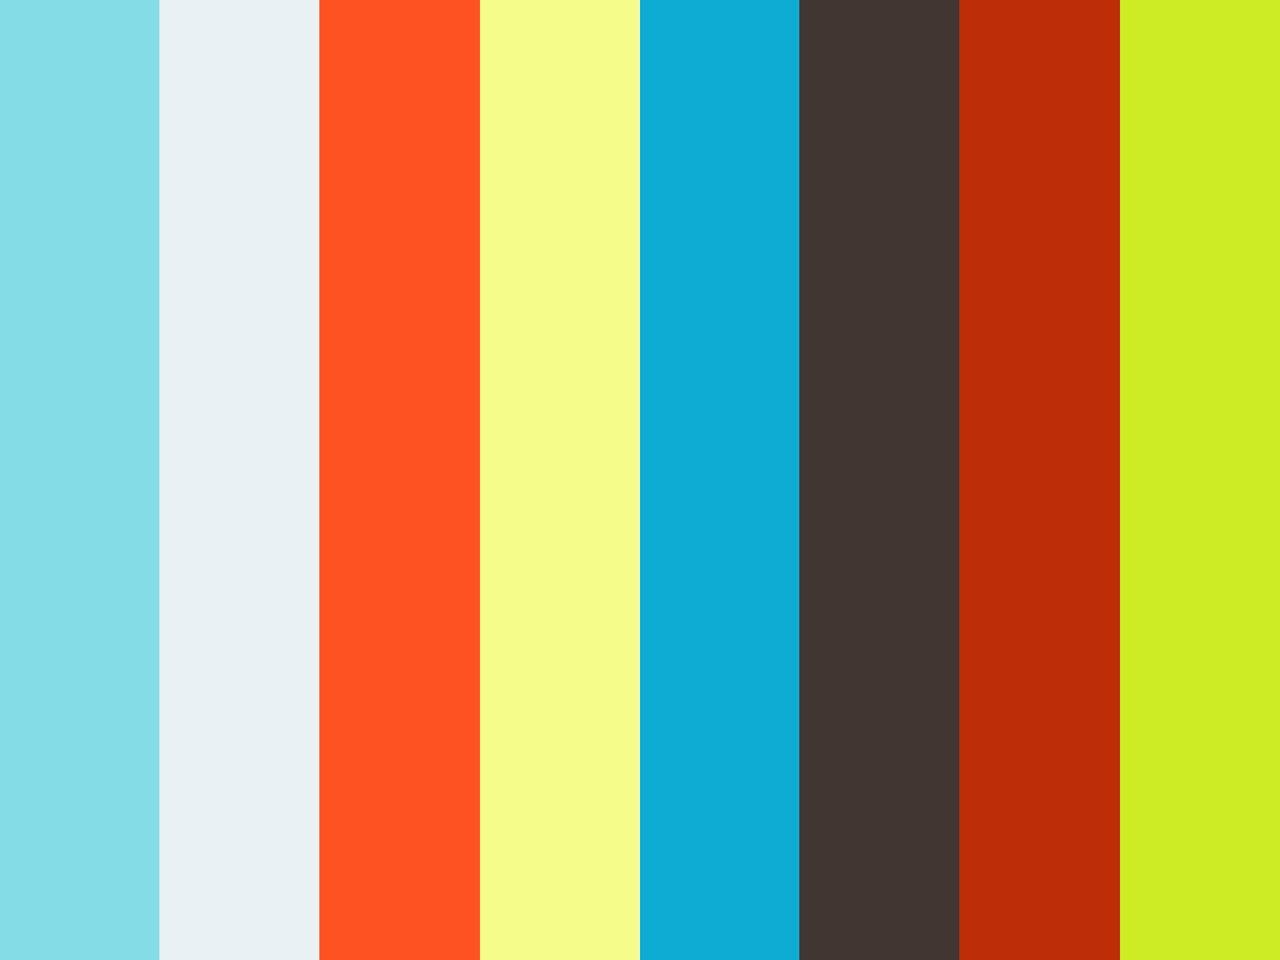 Bureaux: Profile series: Romain Diaz